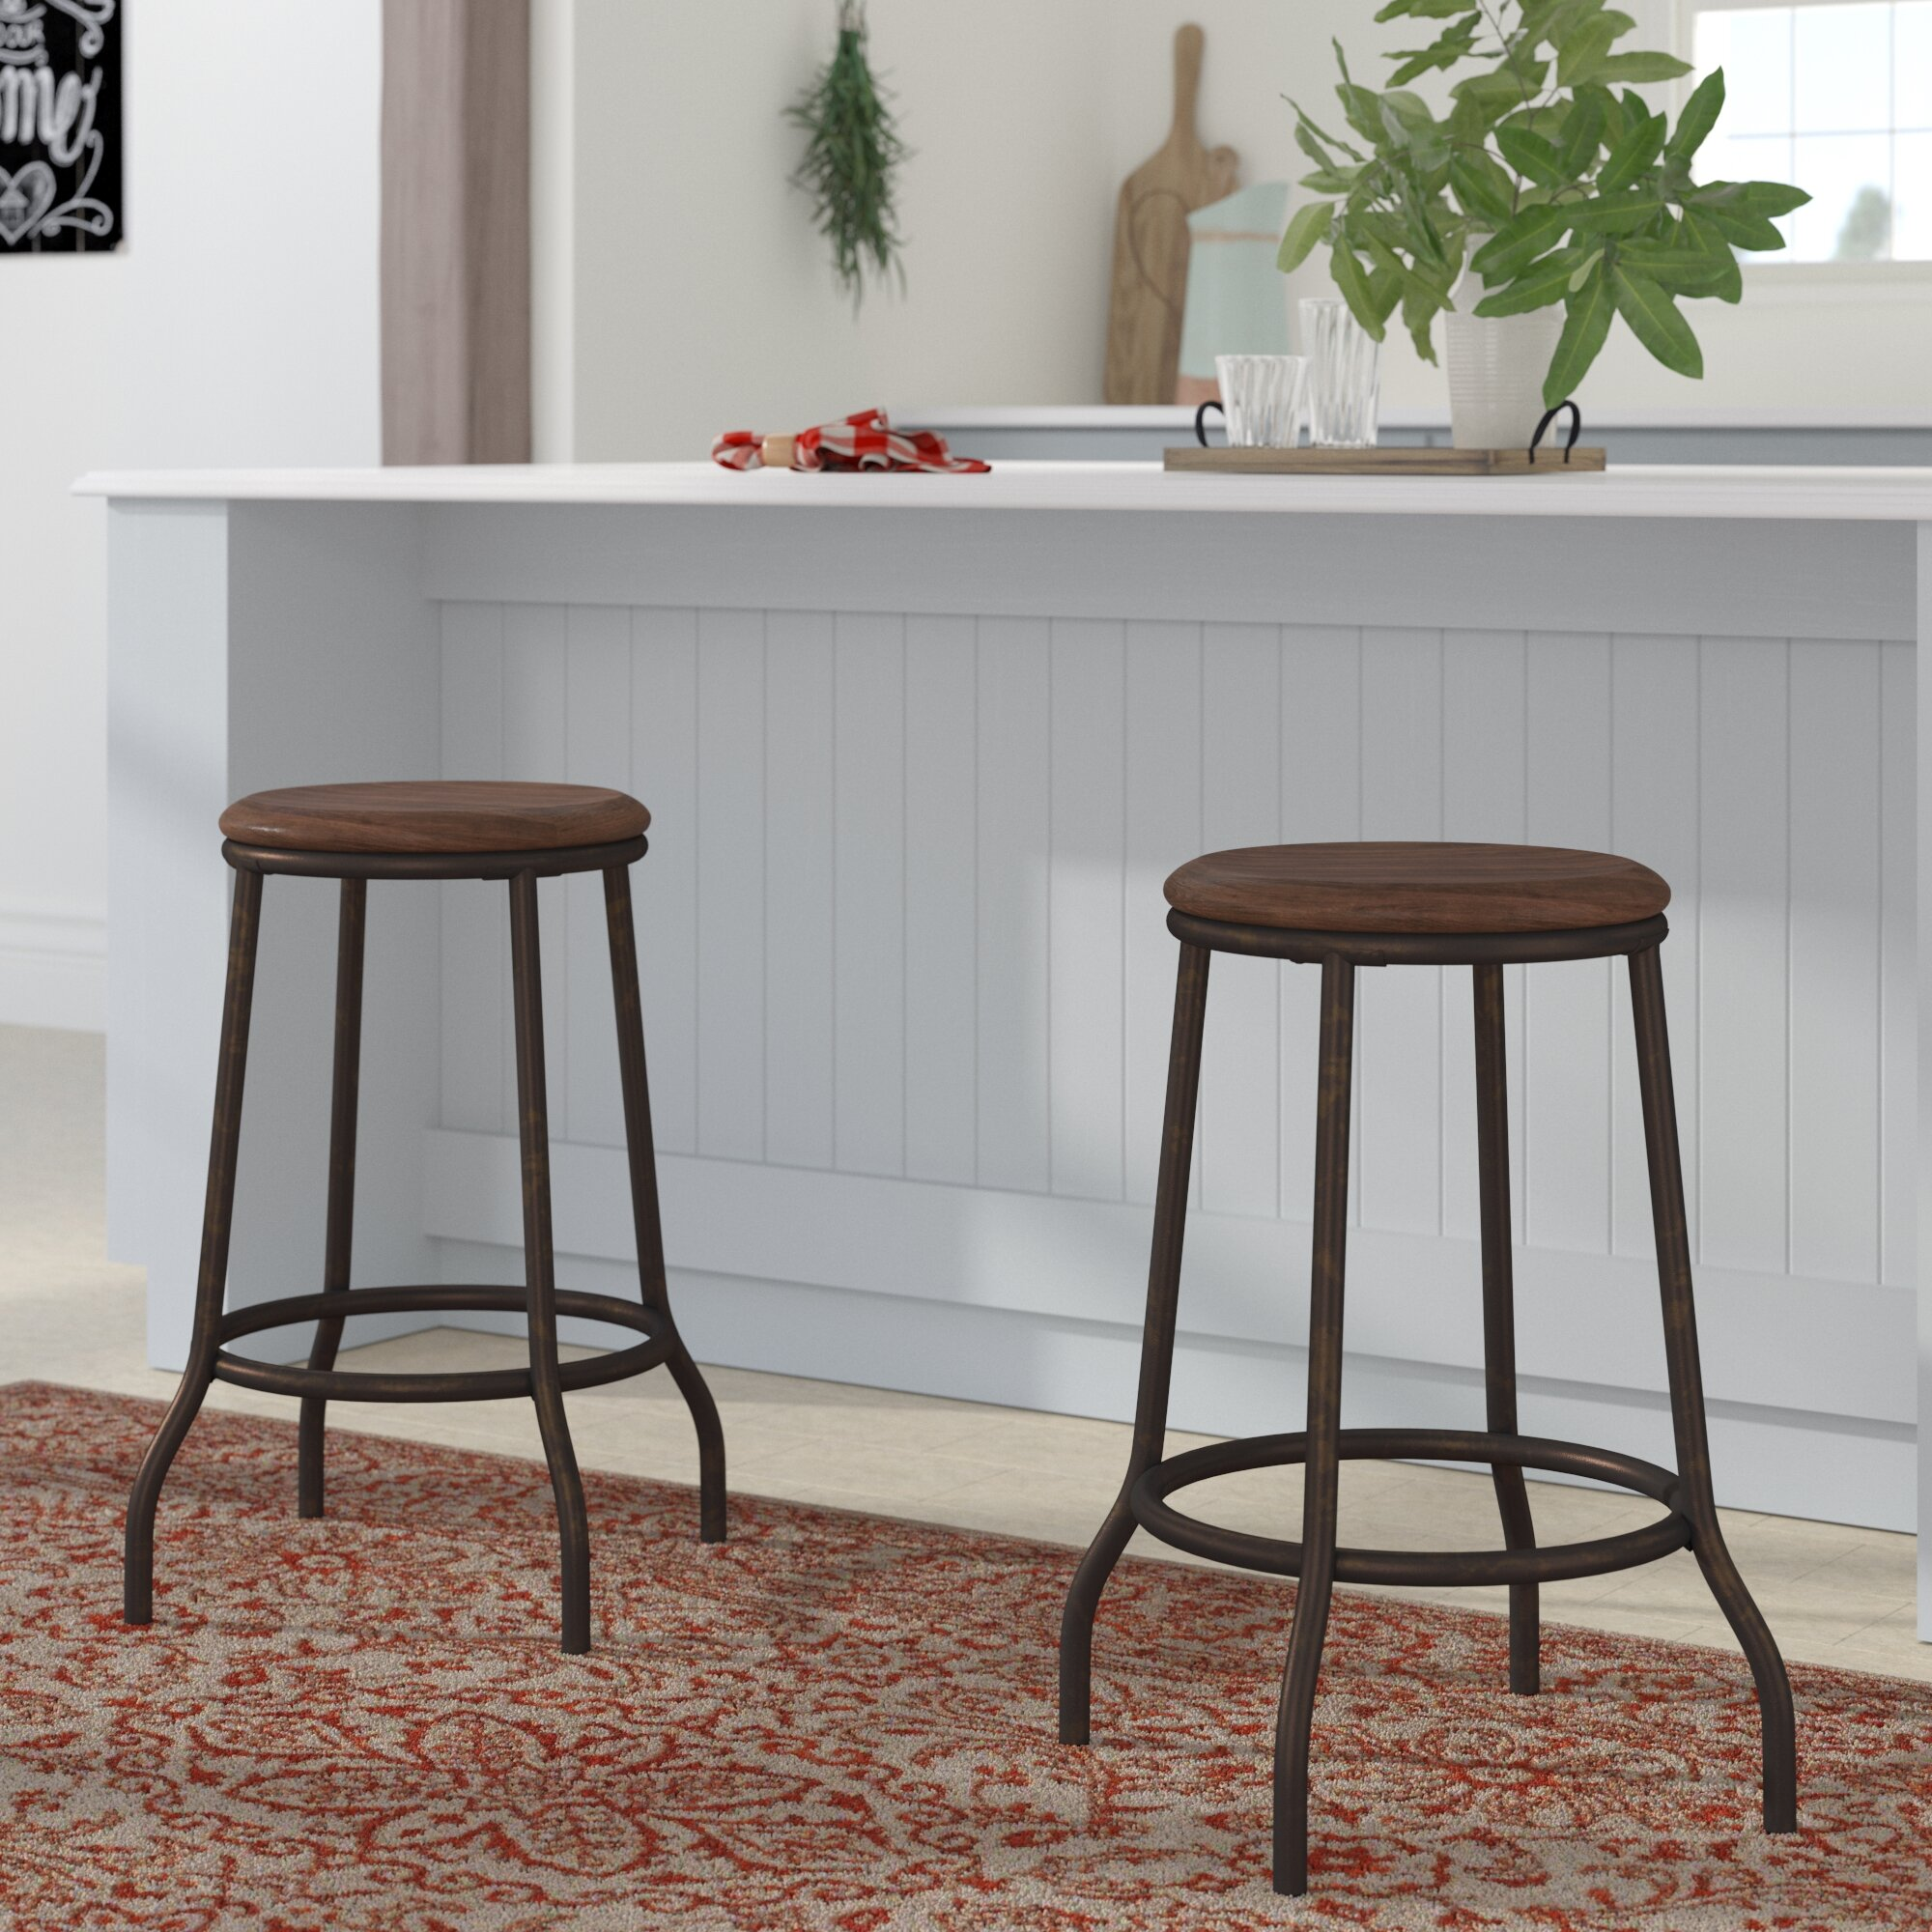 Terrific Maddux Backless Metal 24 Bar Stool Creativecarmelina Interior Chair Design Creativecarmelinacom